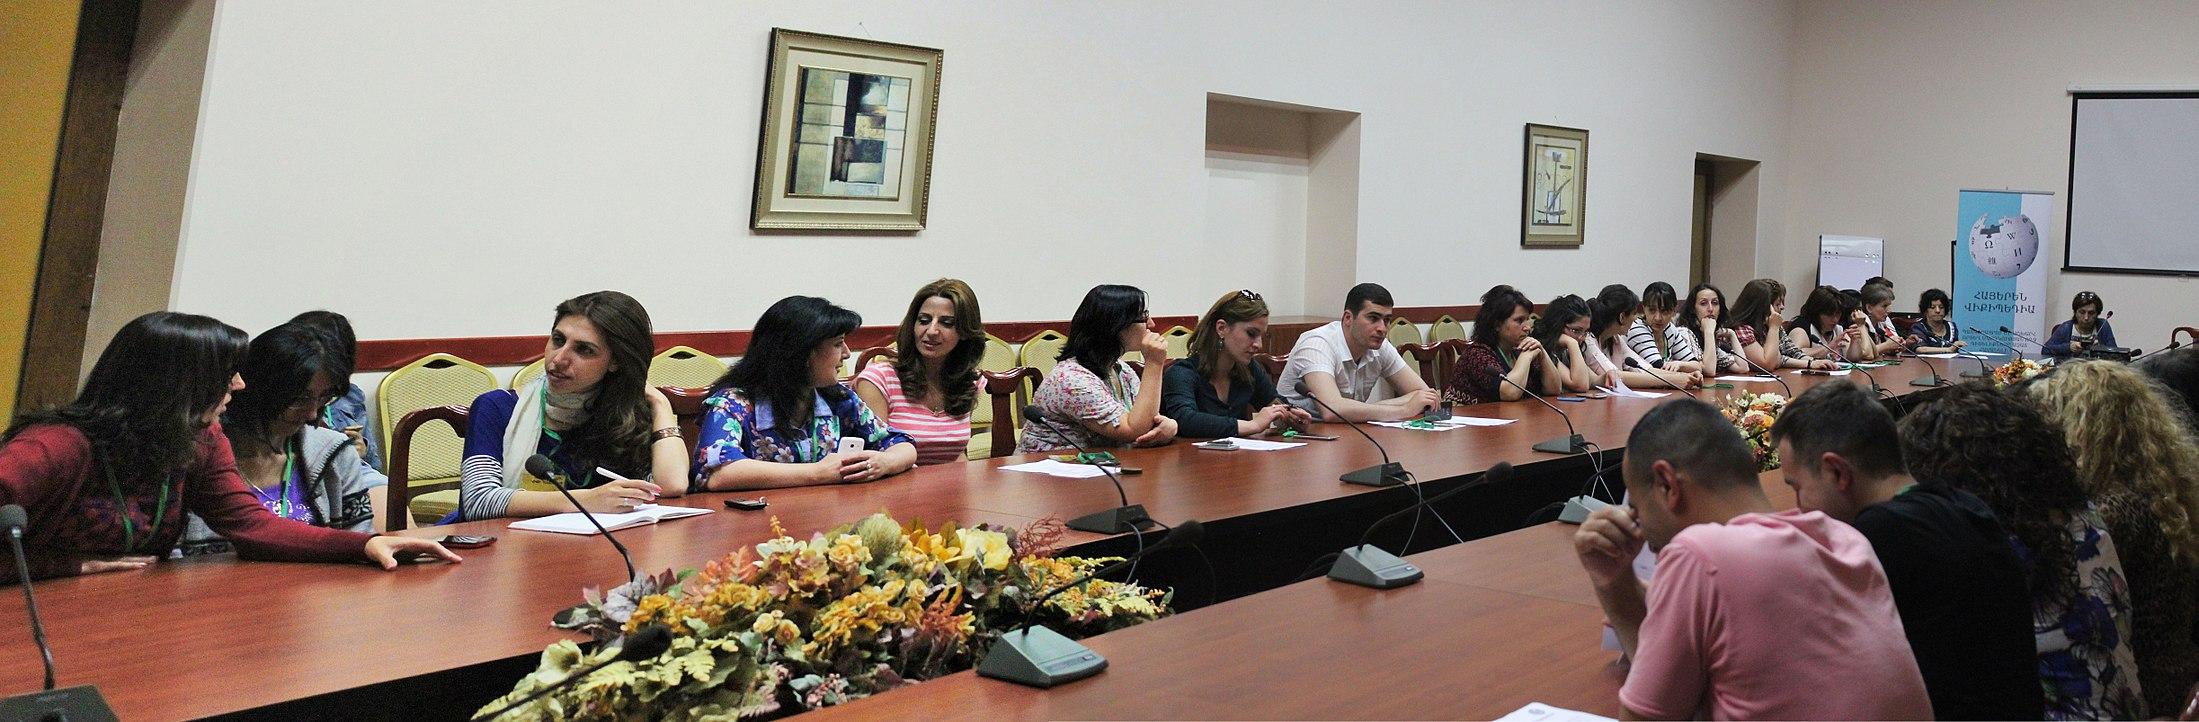 https://upload.wikimedia.org/wikipedia/commons/thumb/7/7e/WMAM_wiki_training_week_with_teachers._23.jpg/2200px-WMAM_wiki_training_week_with_teachers._23.jpg